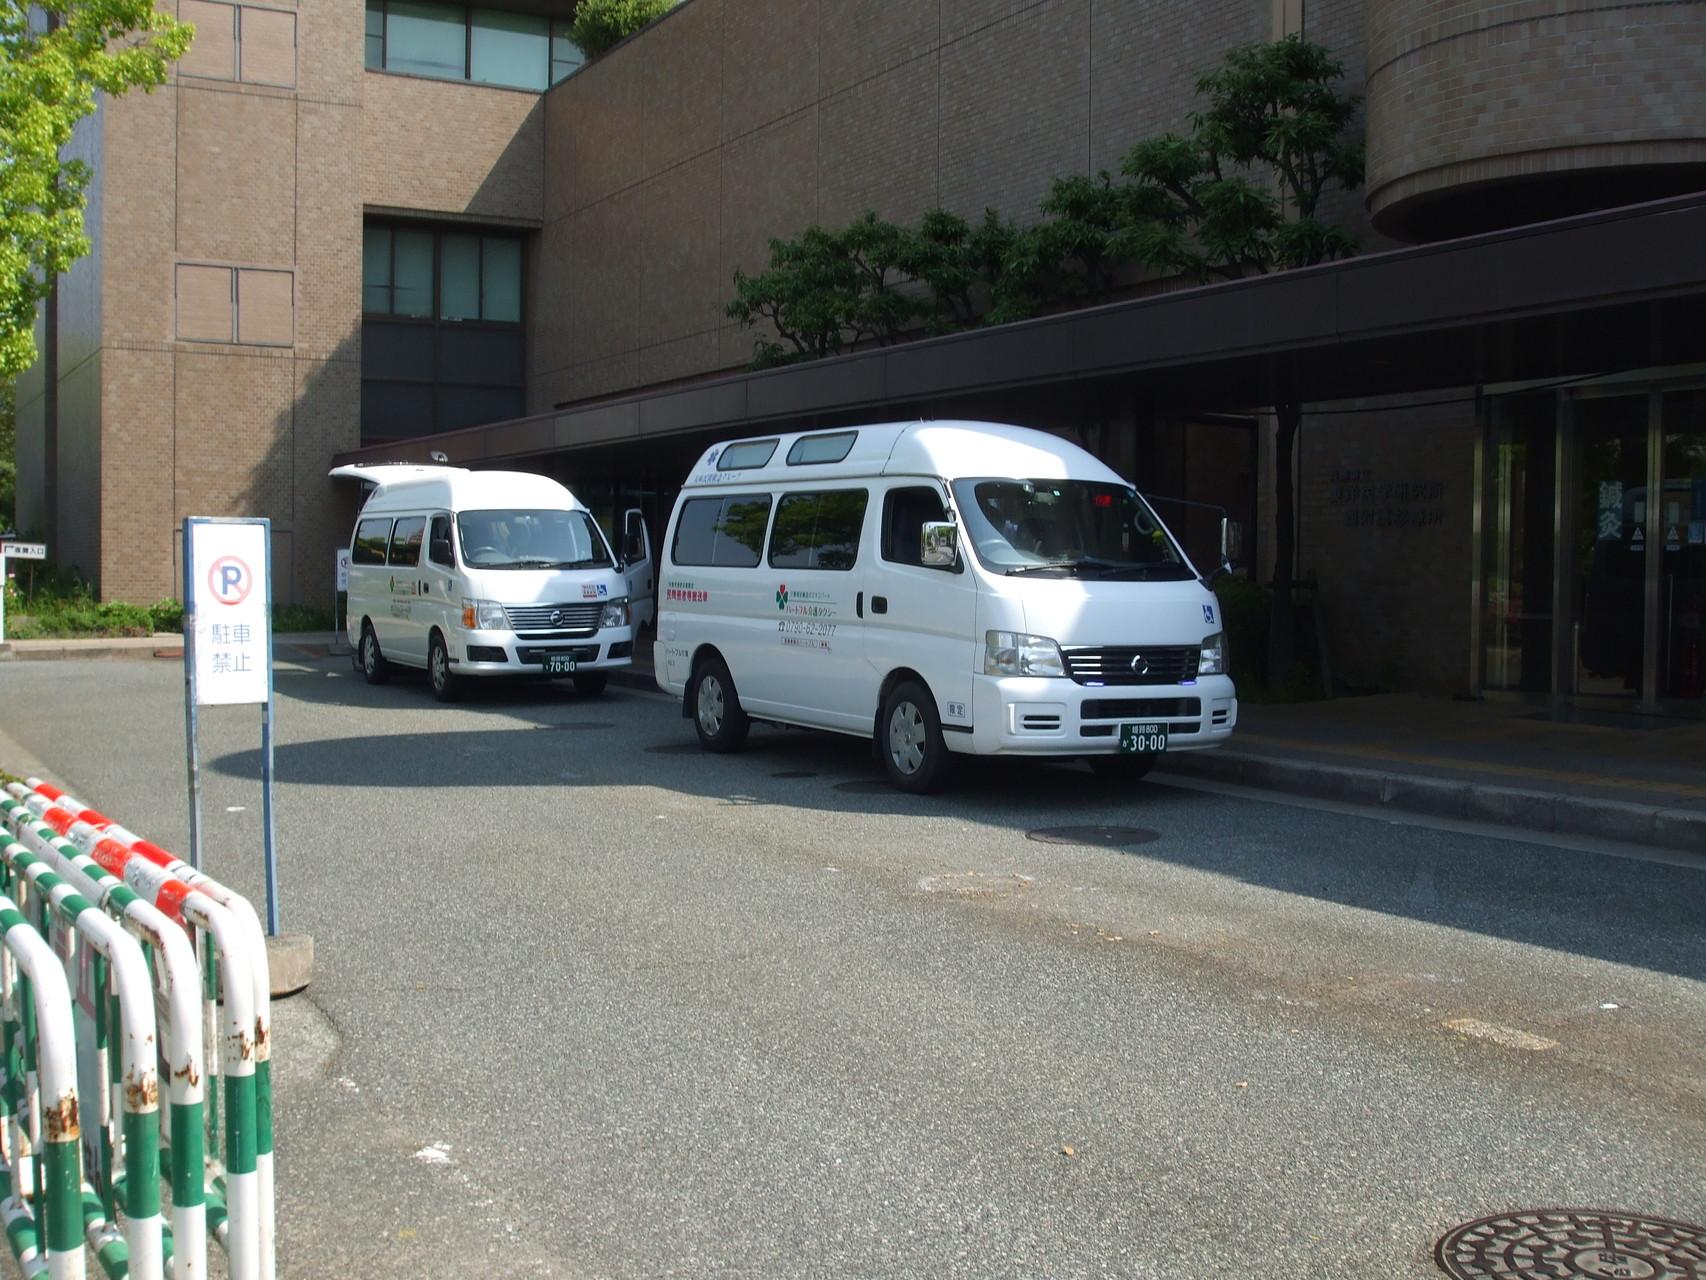 兵庫県立尼崎病院玄関前で弊社の搬送車両が待機中